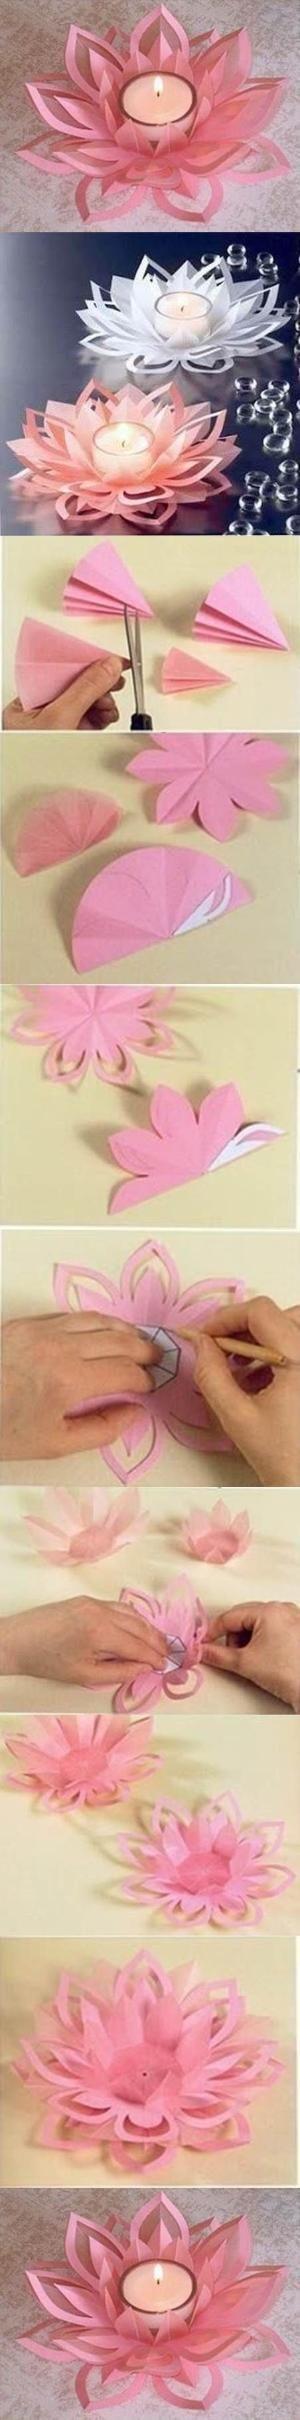 DIY Paper Lotus Candlestick by batjas88